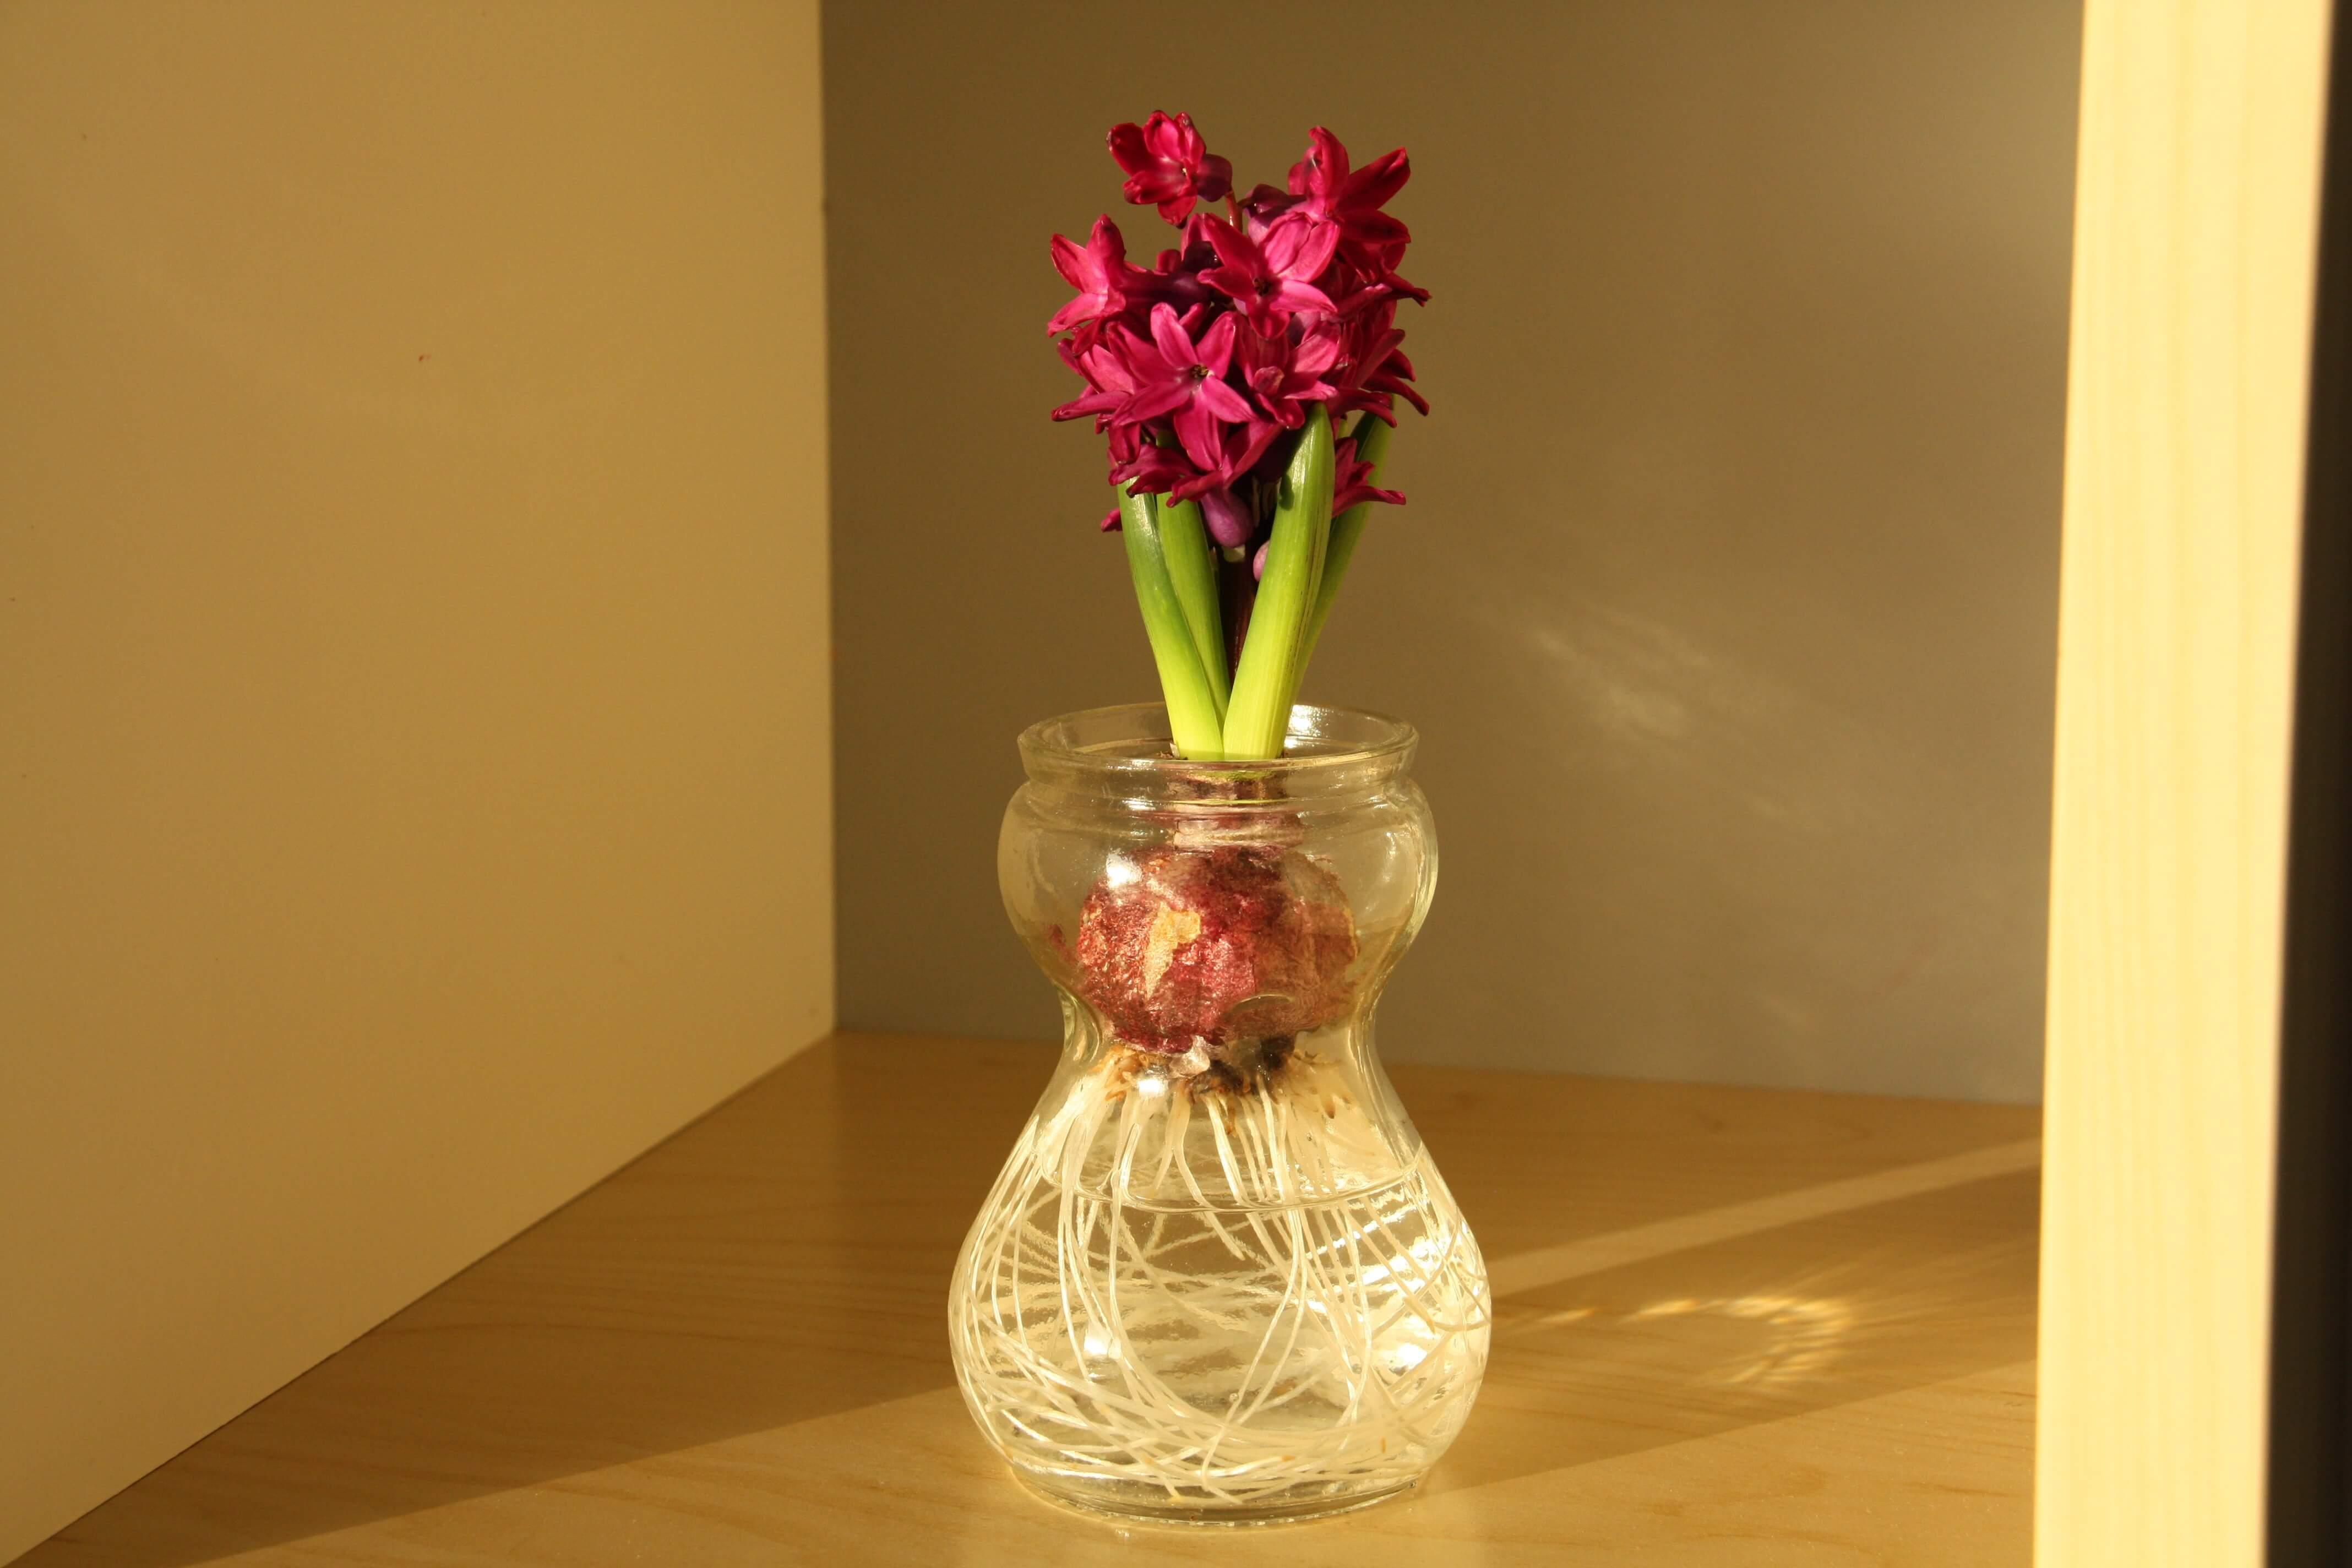 Hyacinth bulb on water.